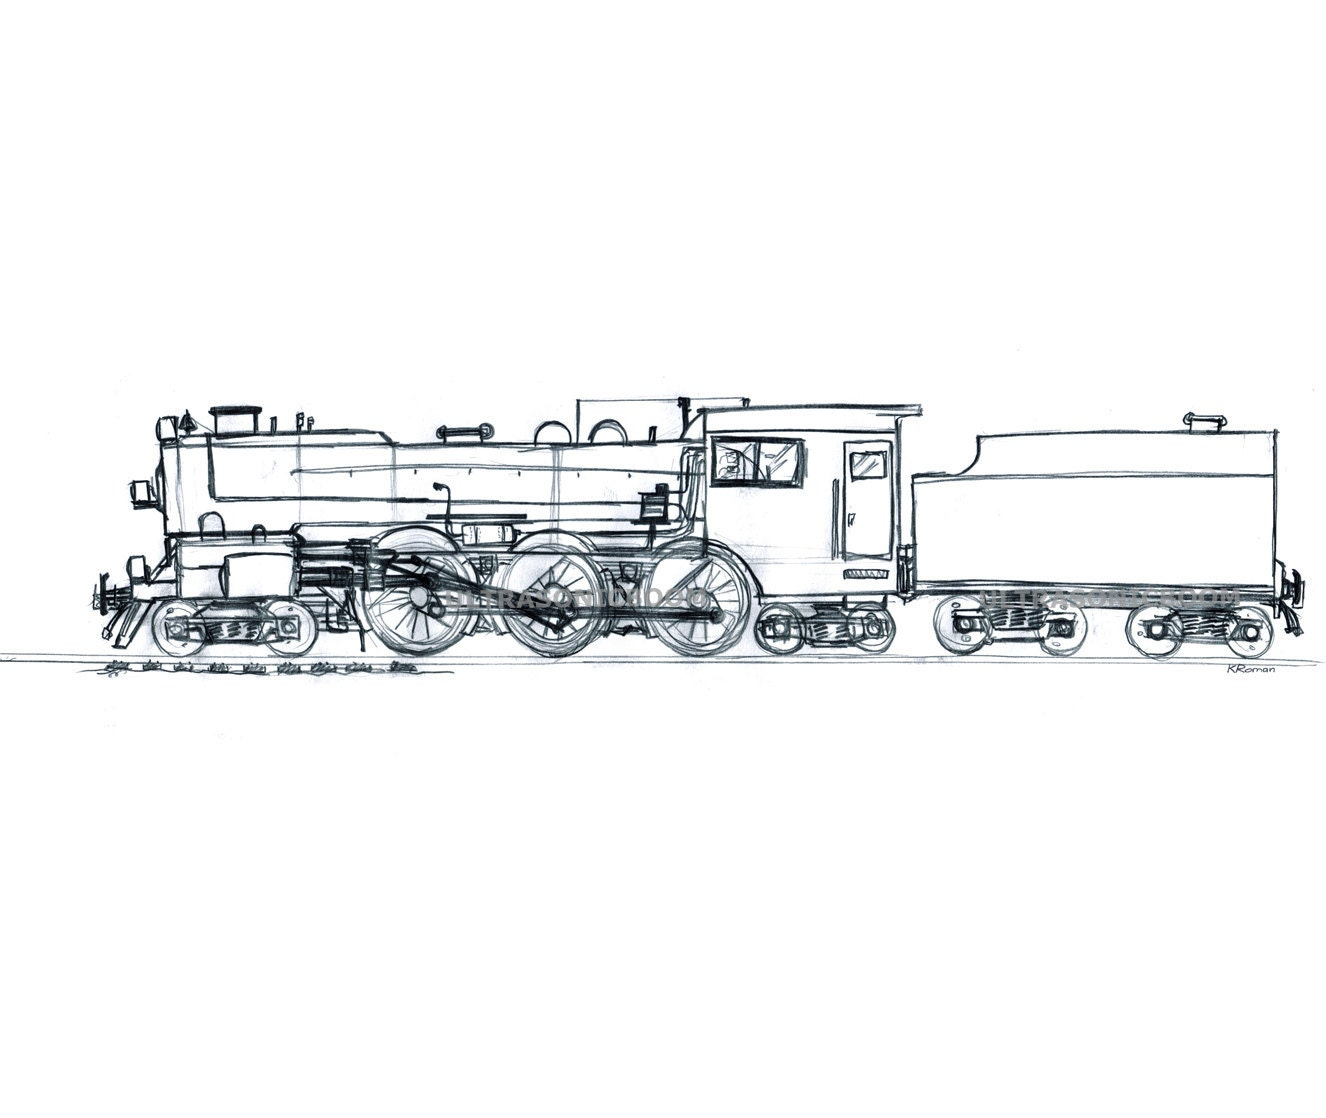 Steam Engine Train Drawing | www.imgkid.com - The Image ...